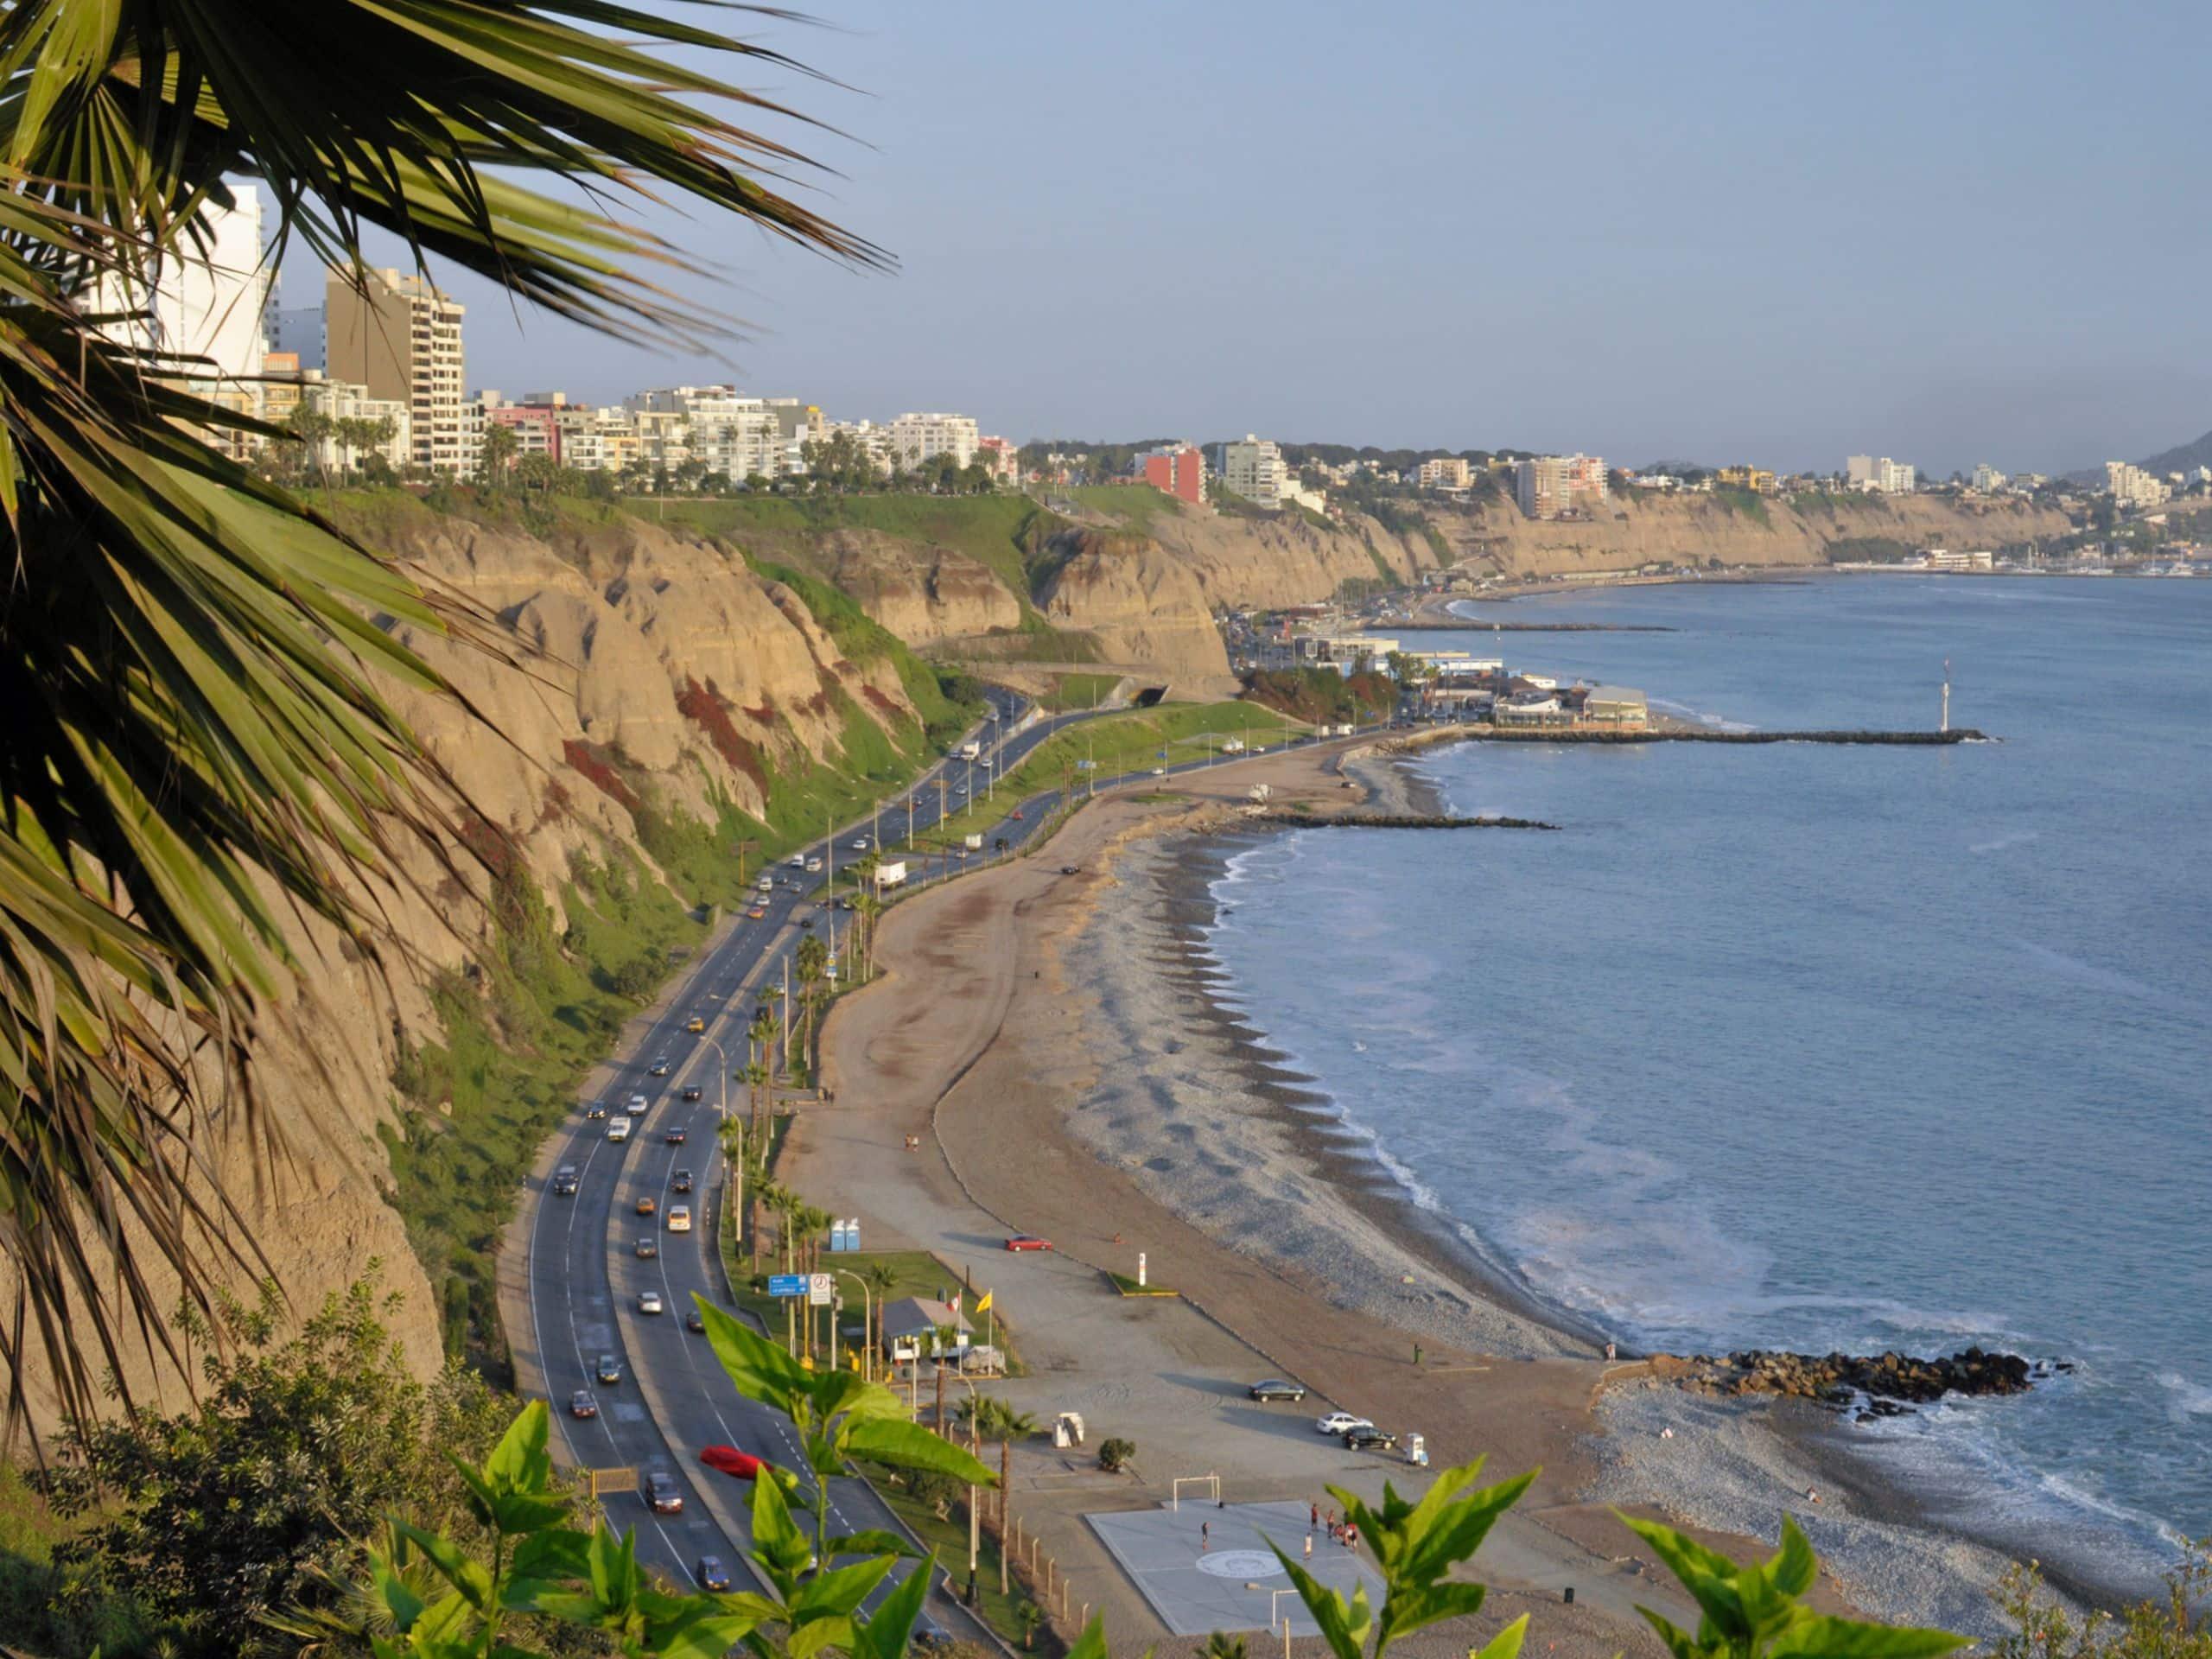 Hotels In Lima Peru Near Bosque El Olivar Hyatt Centric San Isidro